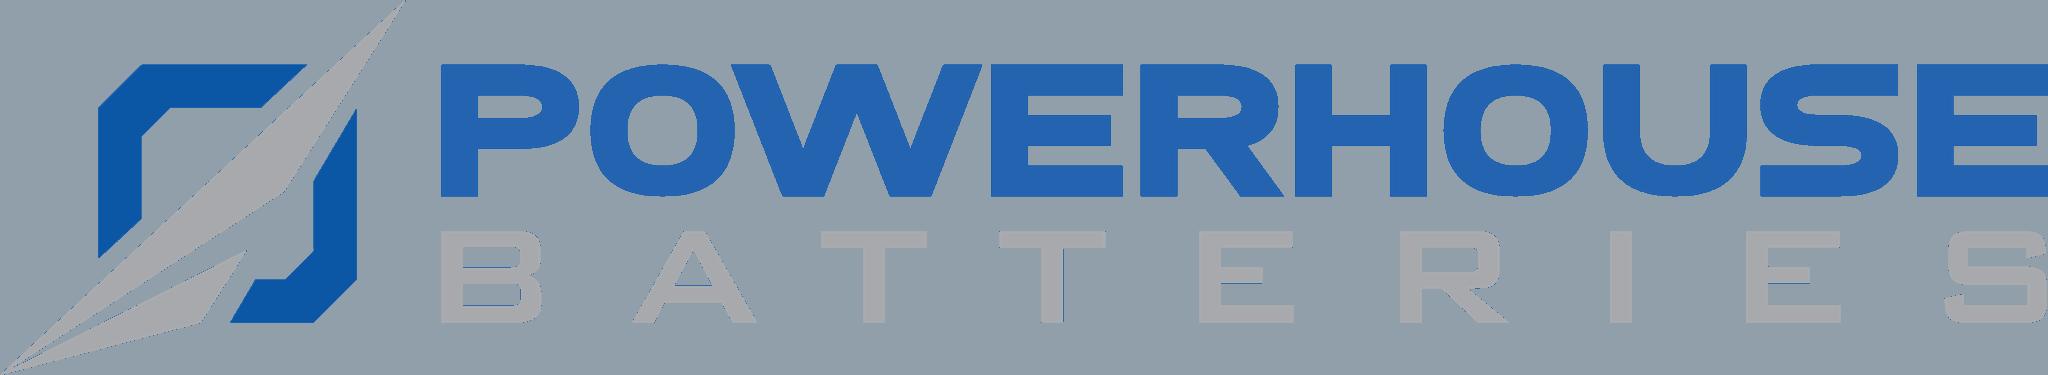 Powerhouse Batteries